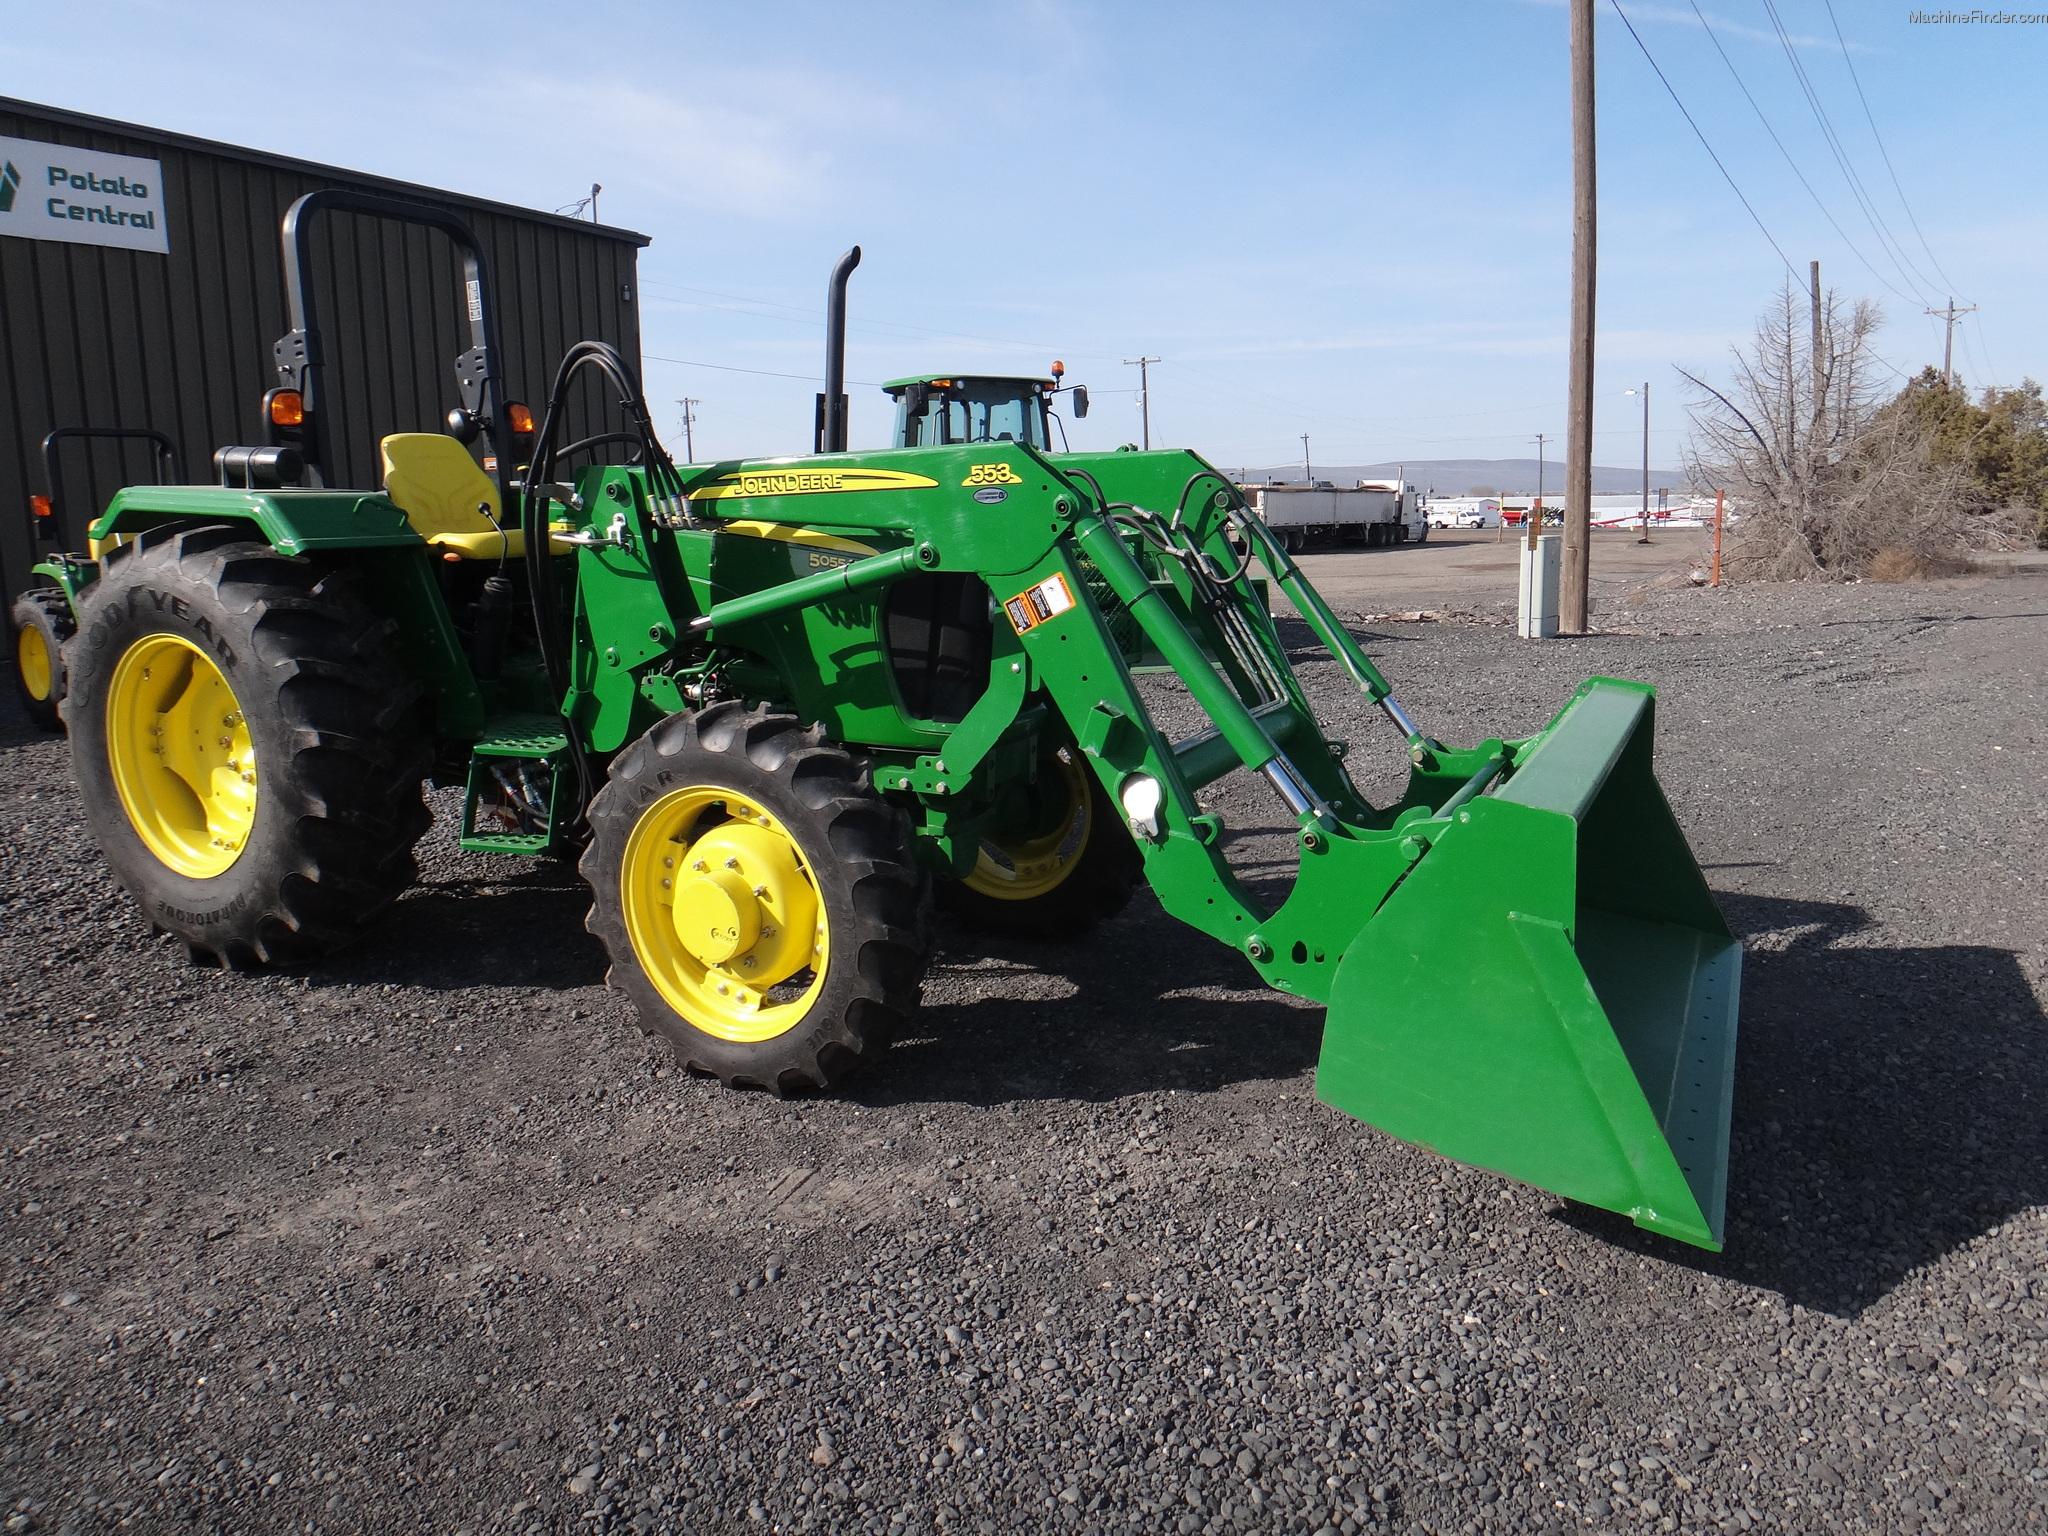 2013 John Deere 5055E & Loader Tractors - Utility (40 ...